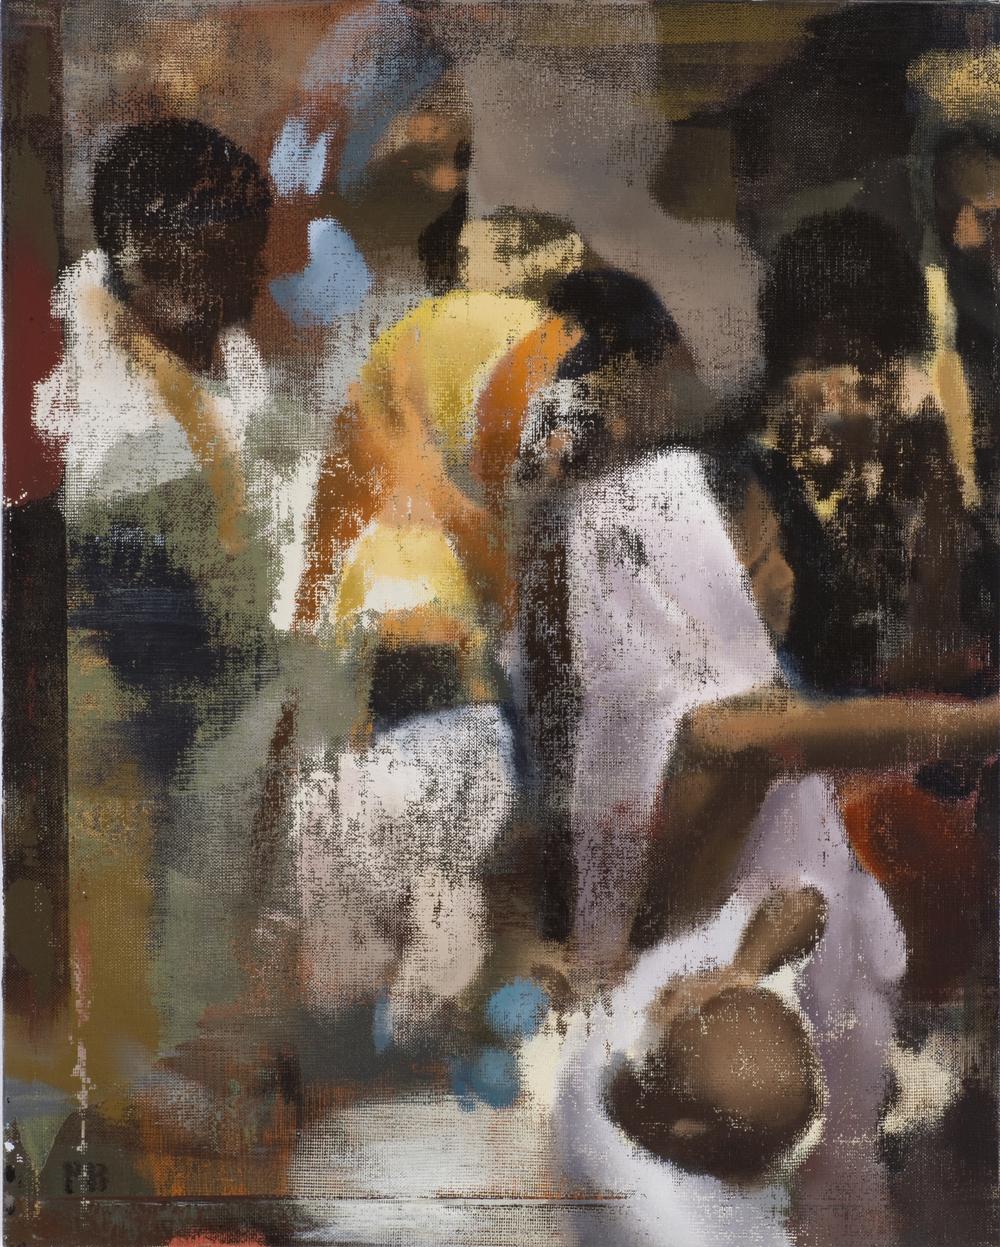 "Pointing, Oil on Linen on Panel, 2008, 30"" x 24"""